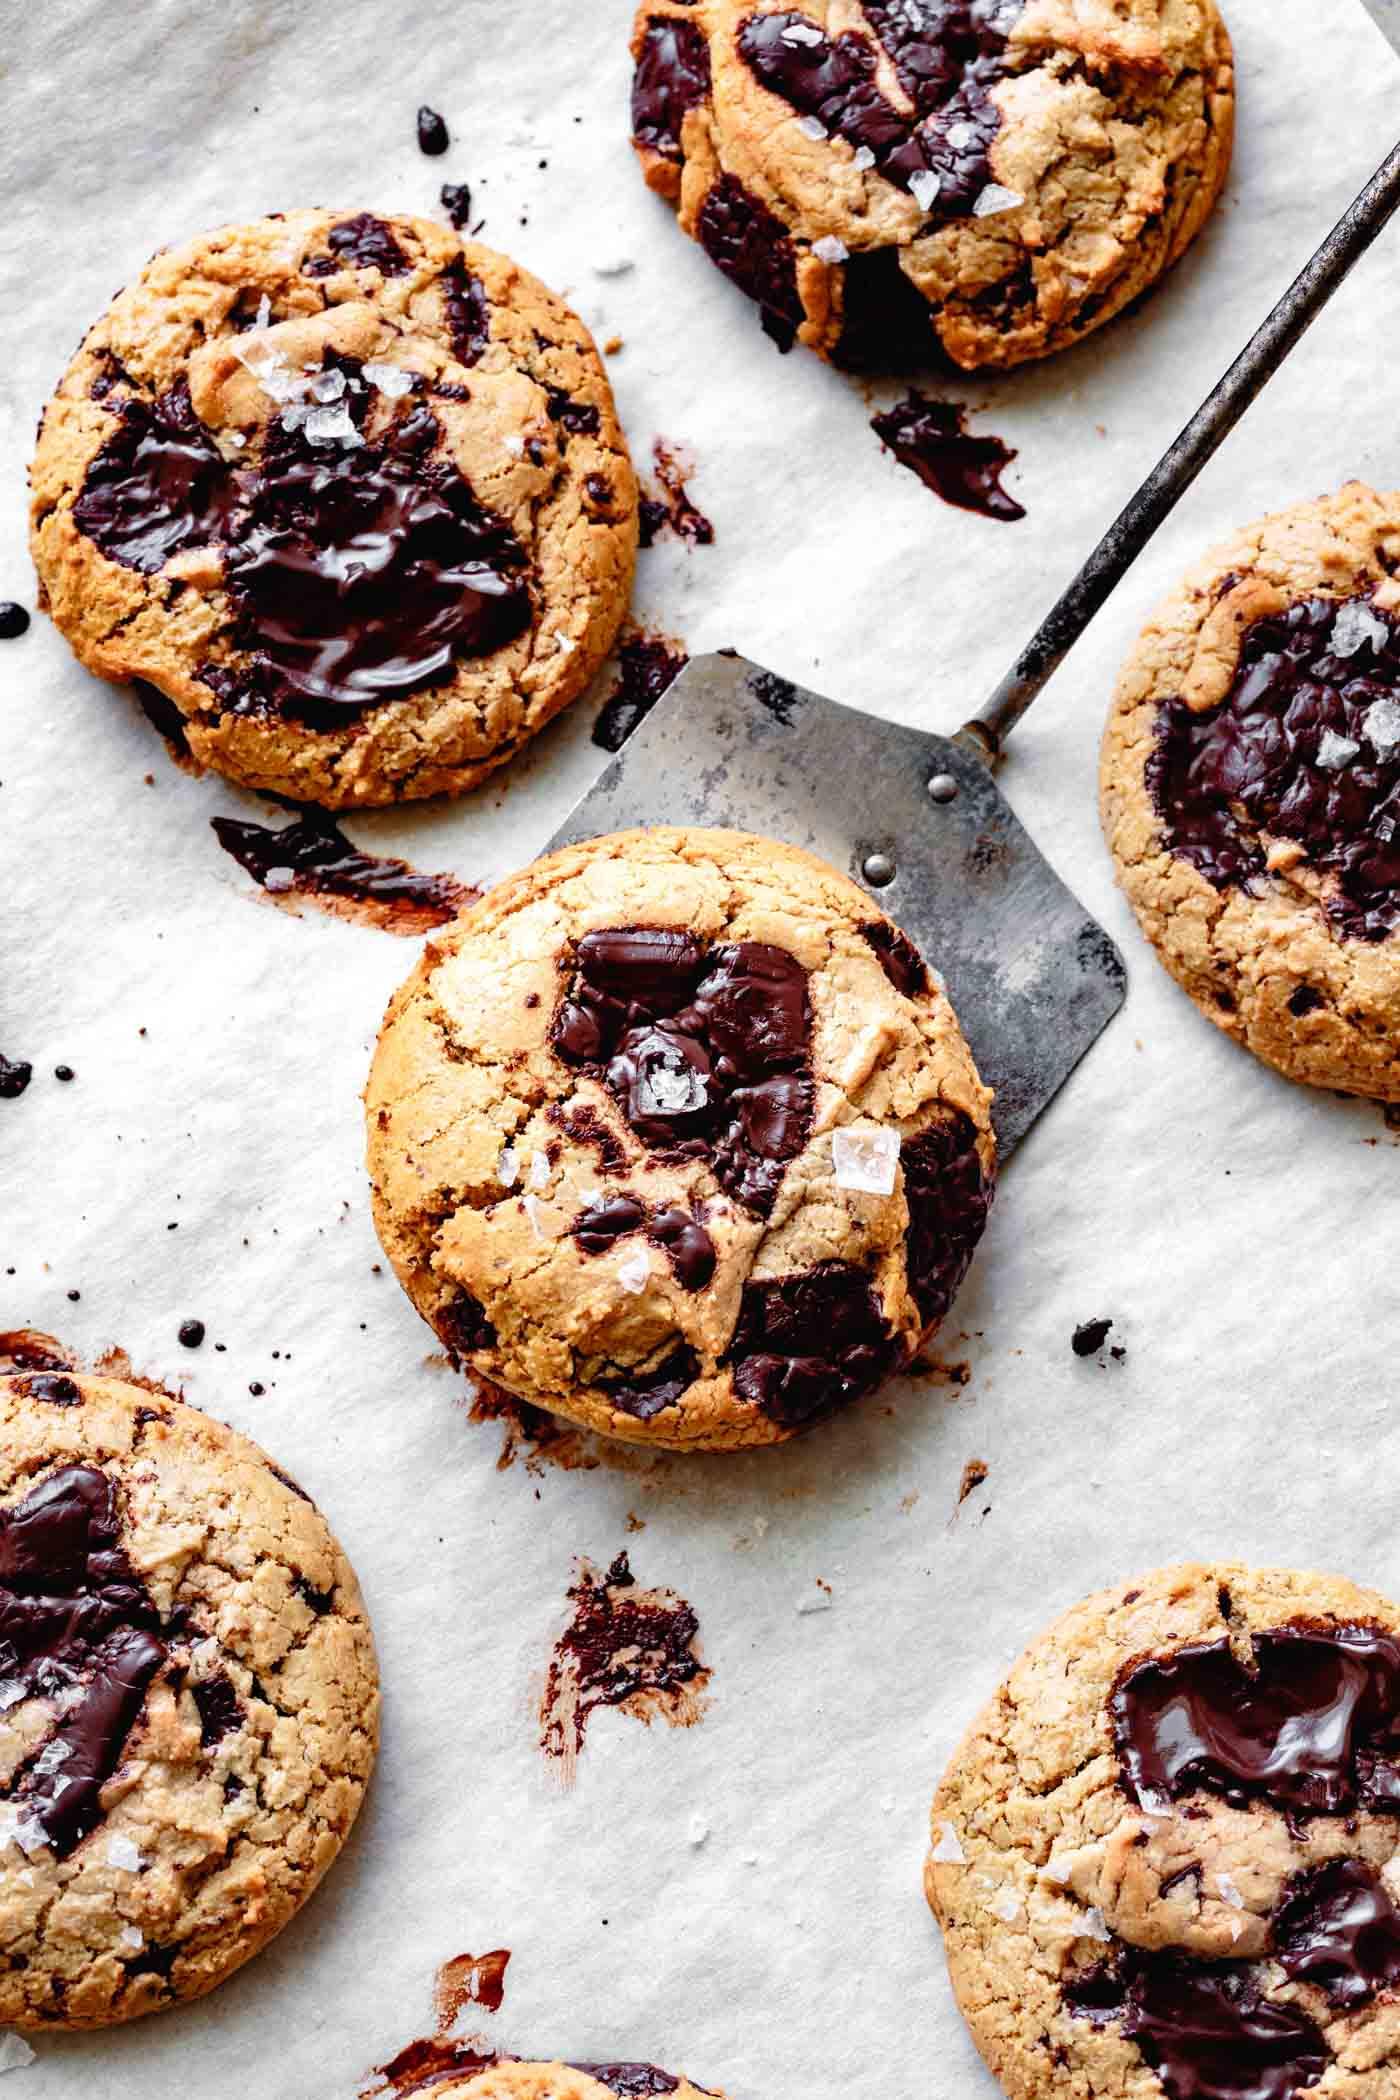 vegan gf cookies, fresh from the oven